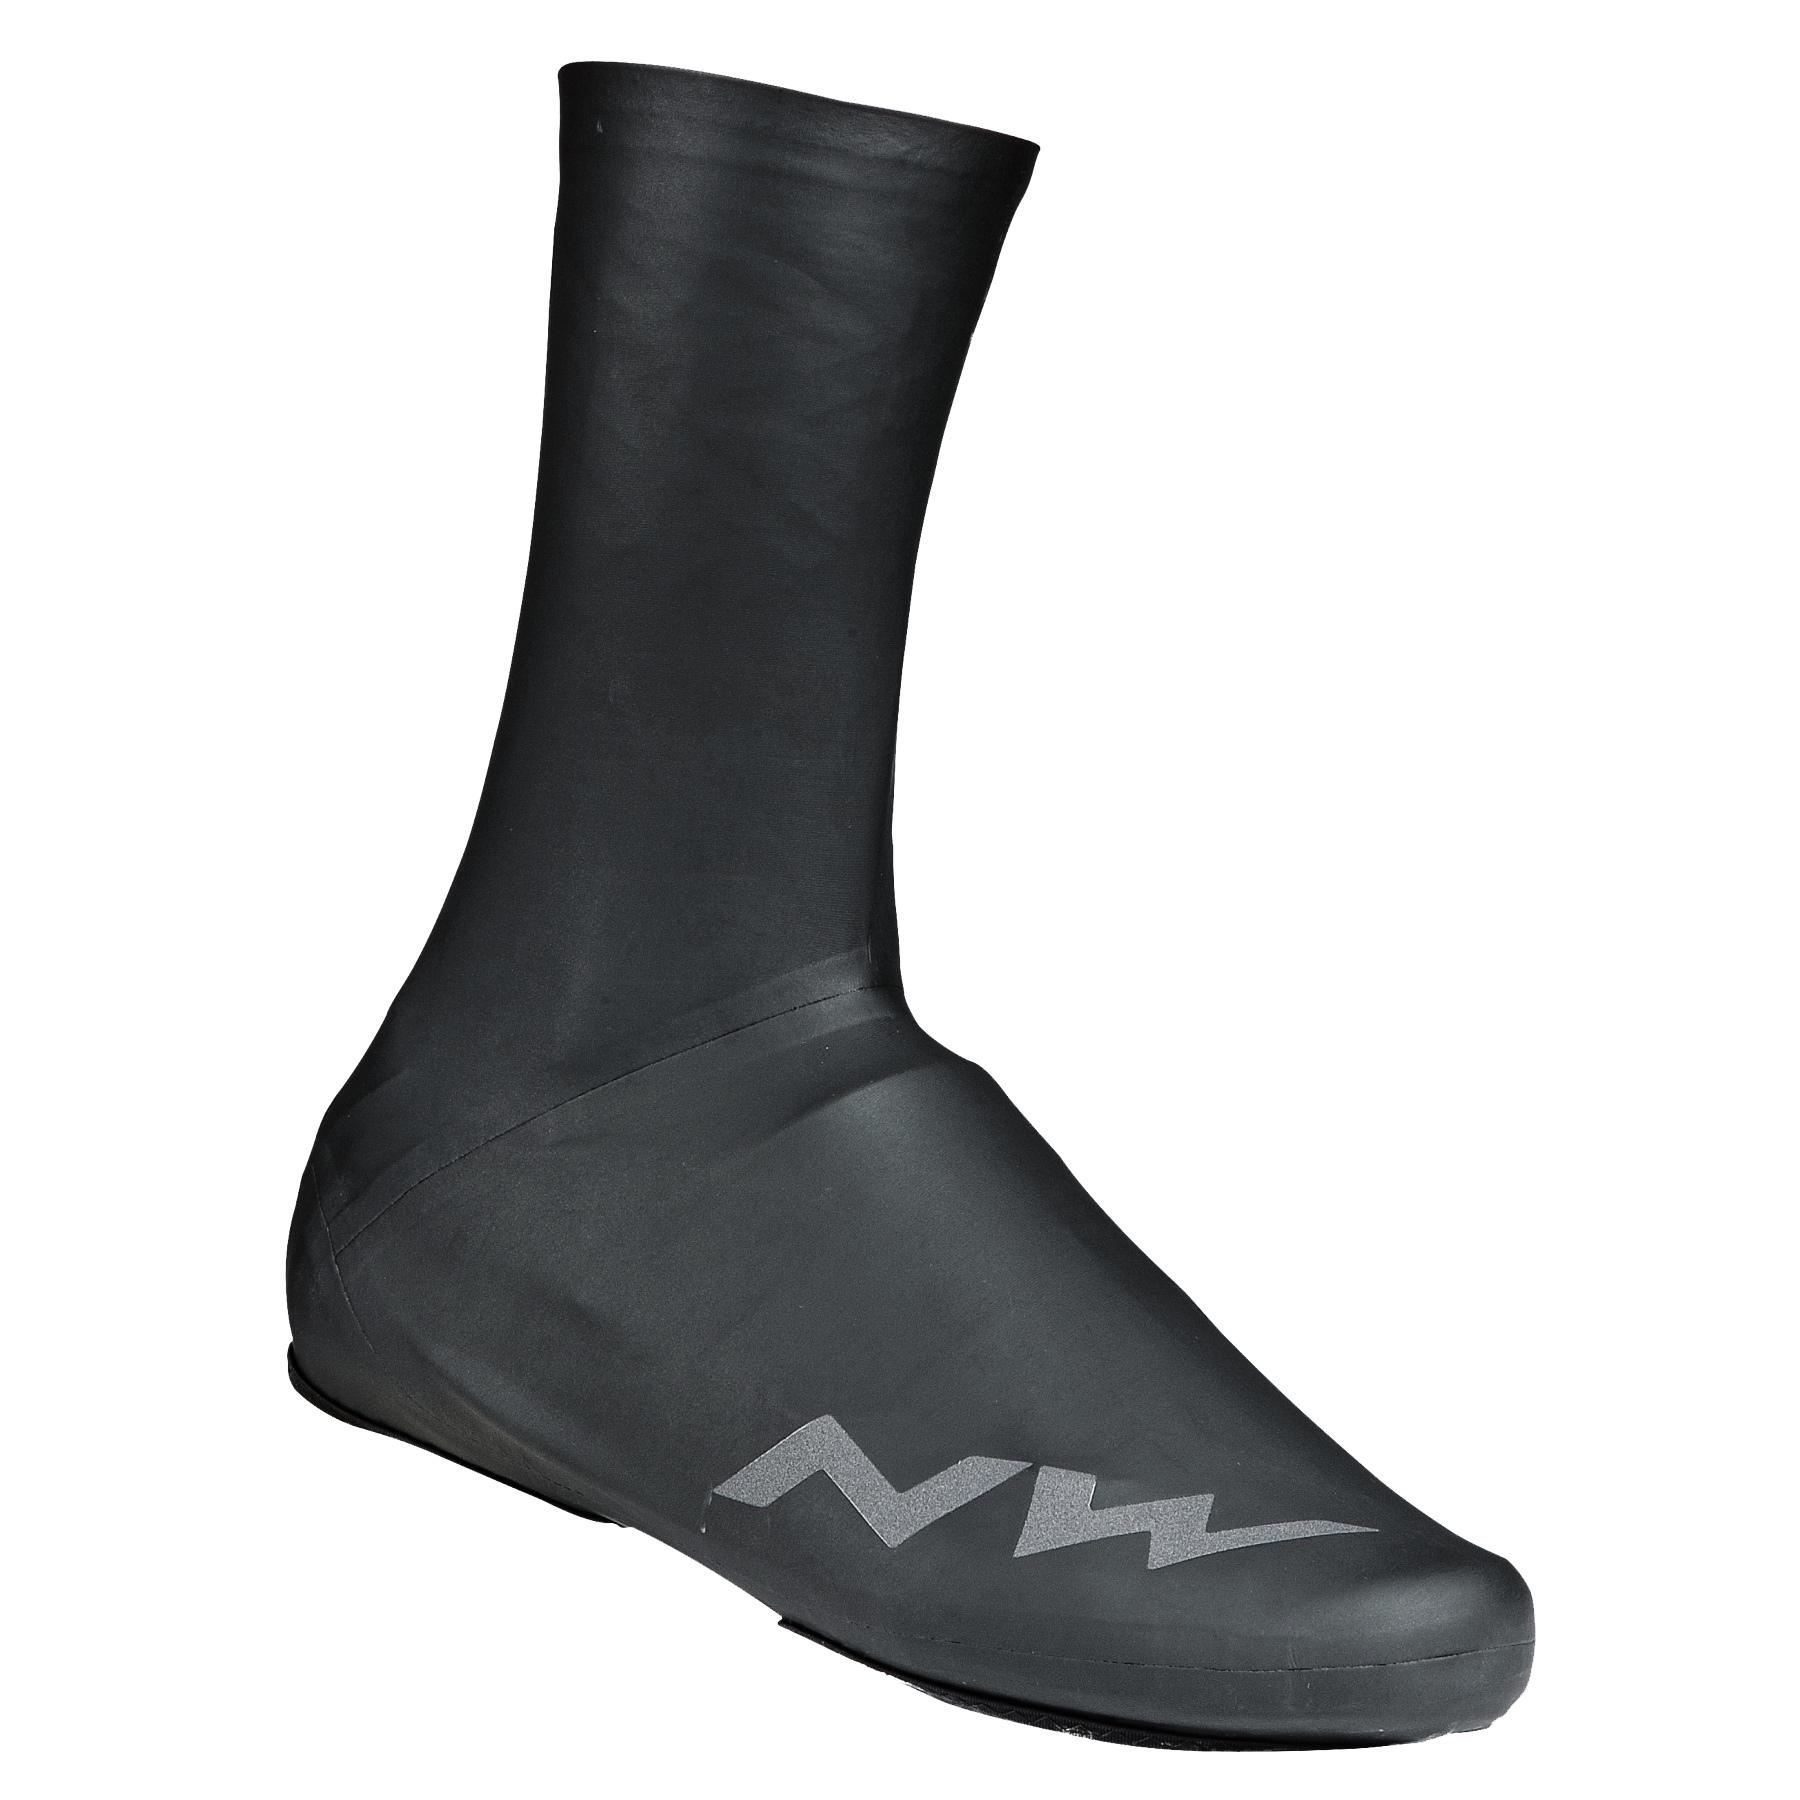 Northwave Fast H20 Shoecover - black 10